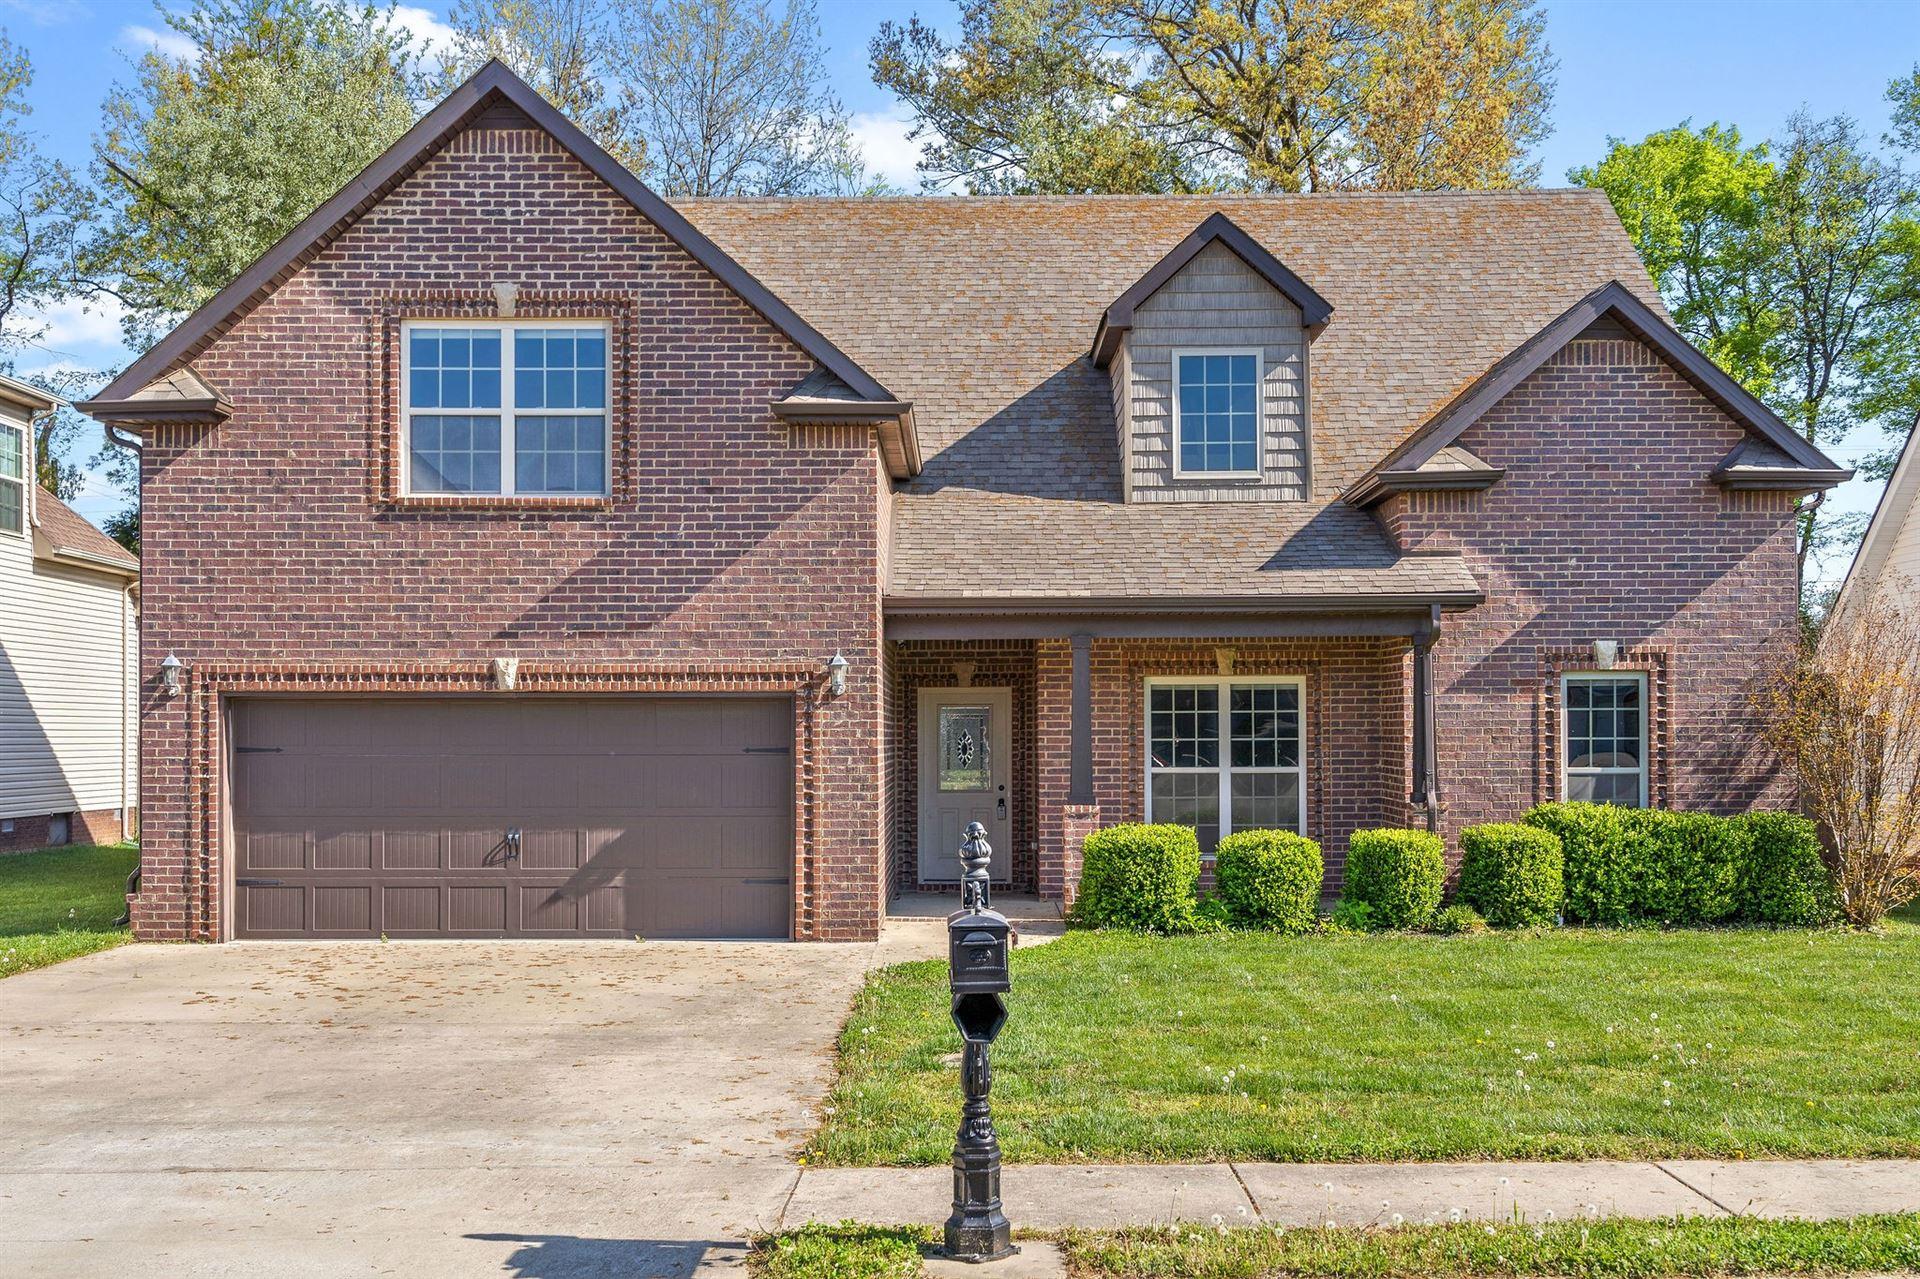 1268 Golden Eagle Way, Clarksville, TN 37040 - MLS#: 2244073